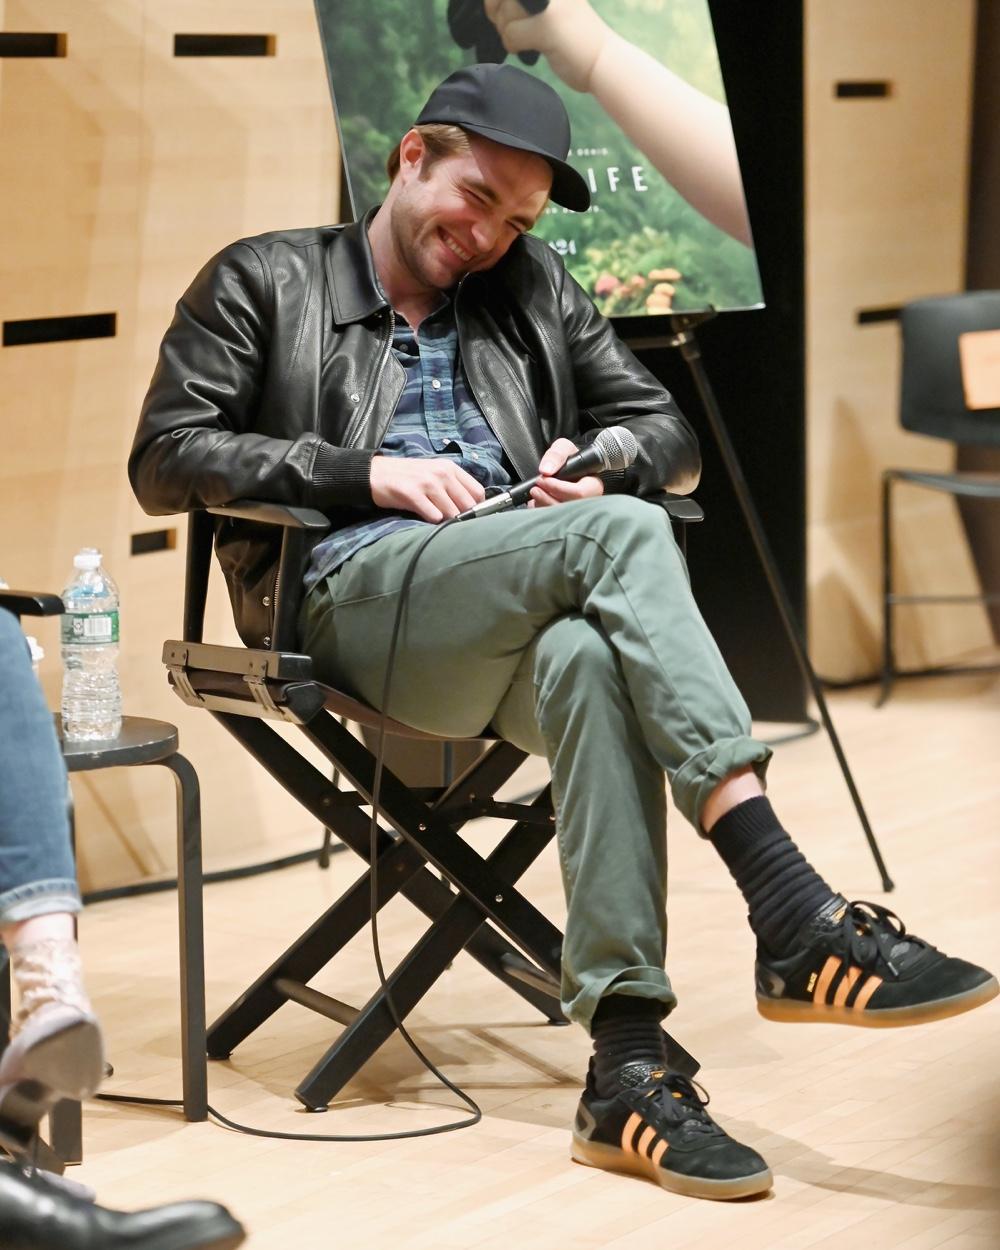 Robert Pattinson Film Comment Free Talk